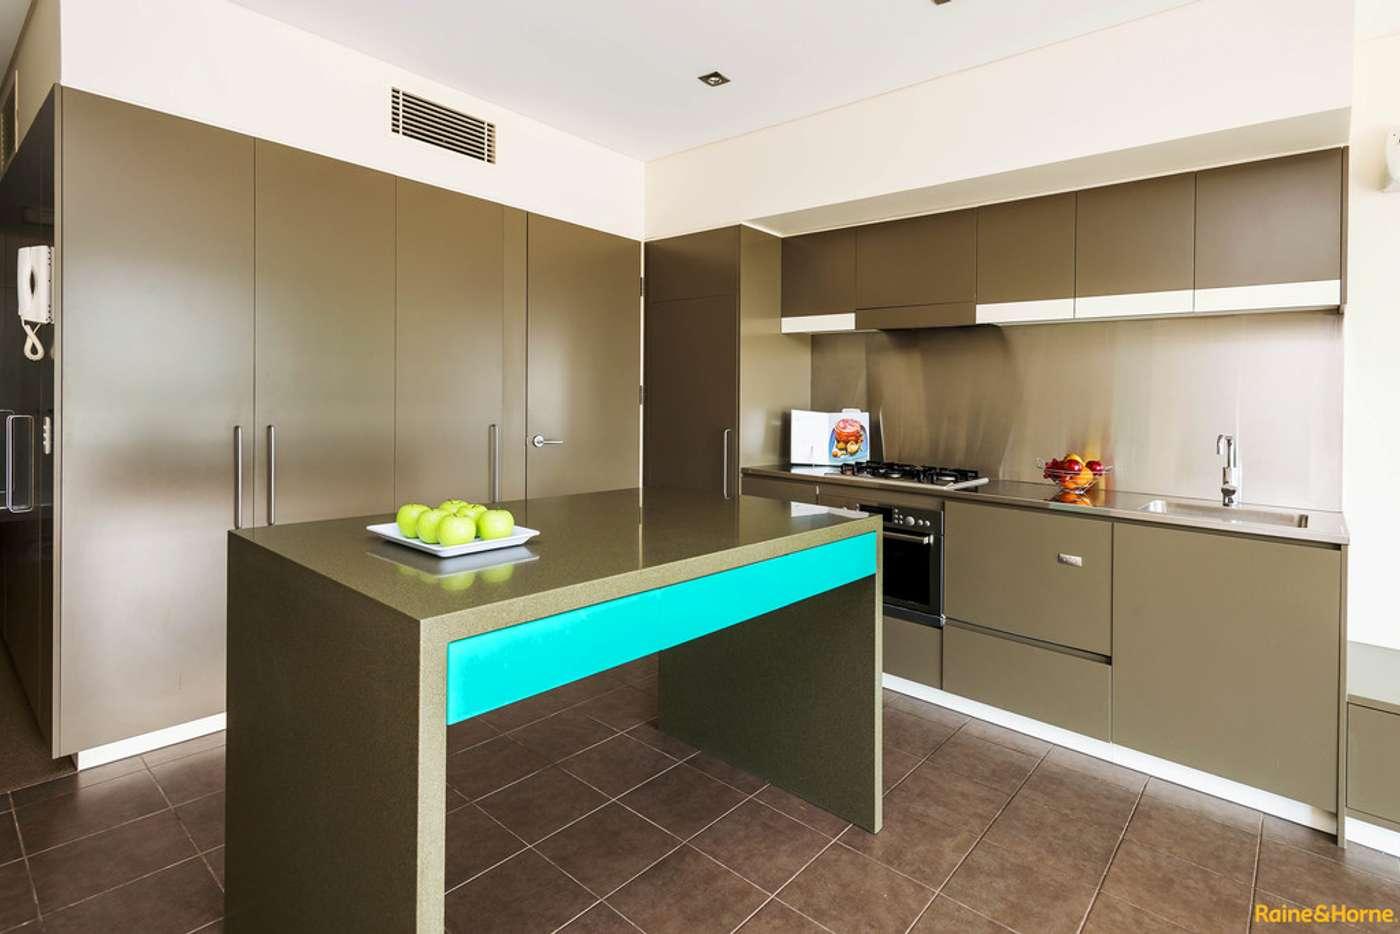 Main view of Homely apartment listing, 21/1 Alexandra Street, Paddington QLD 4064